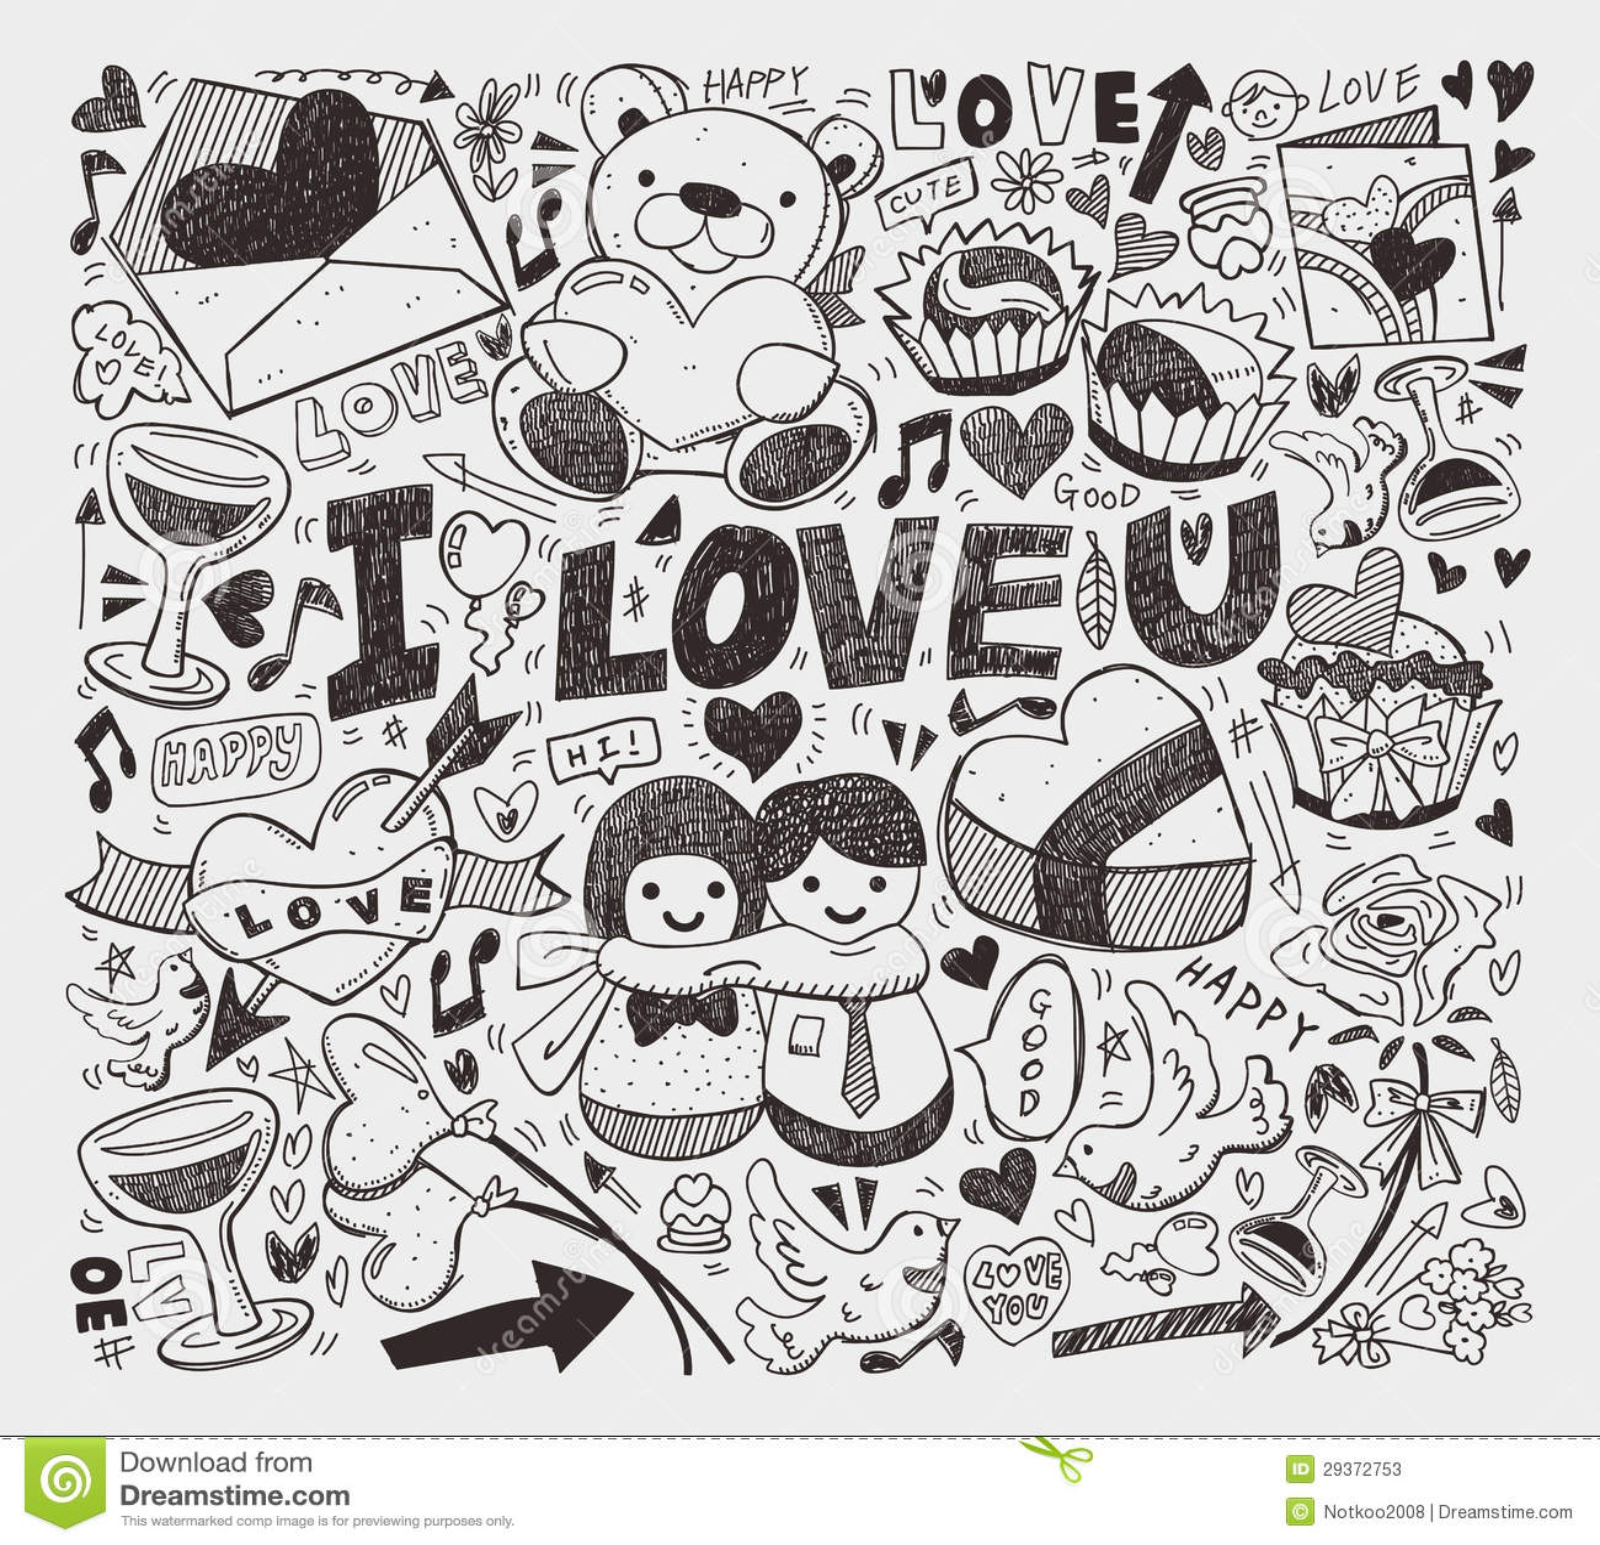 Doodle Love Element Stock Photos Image 29372753